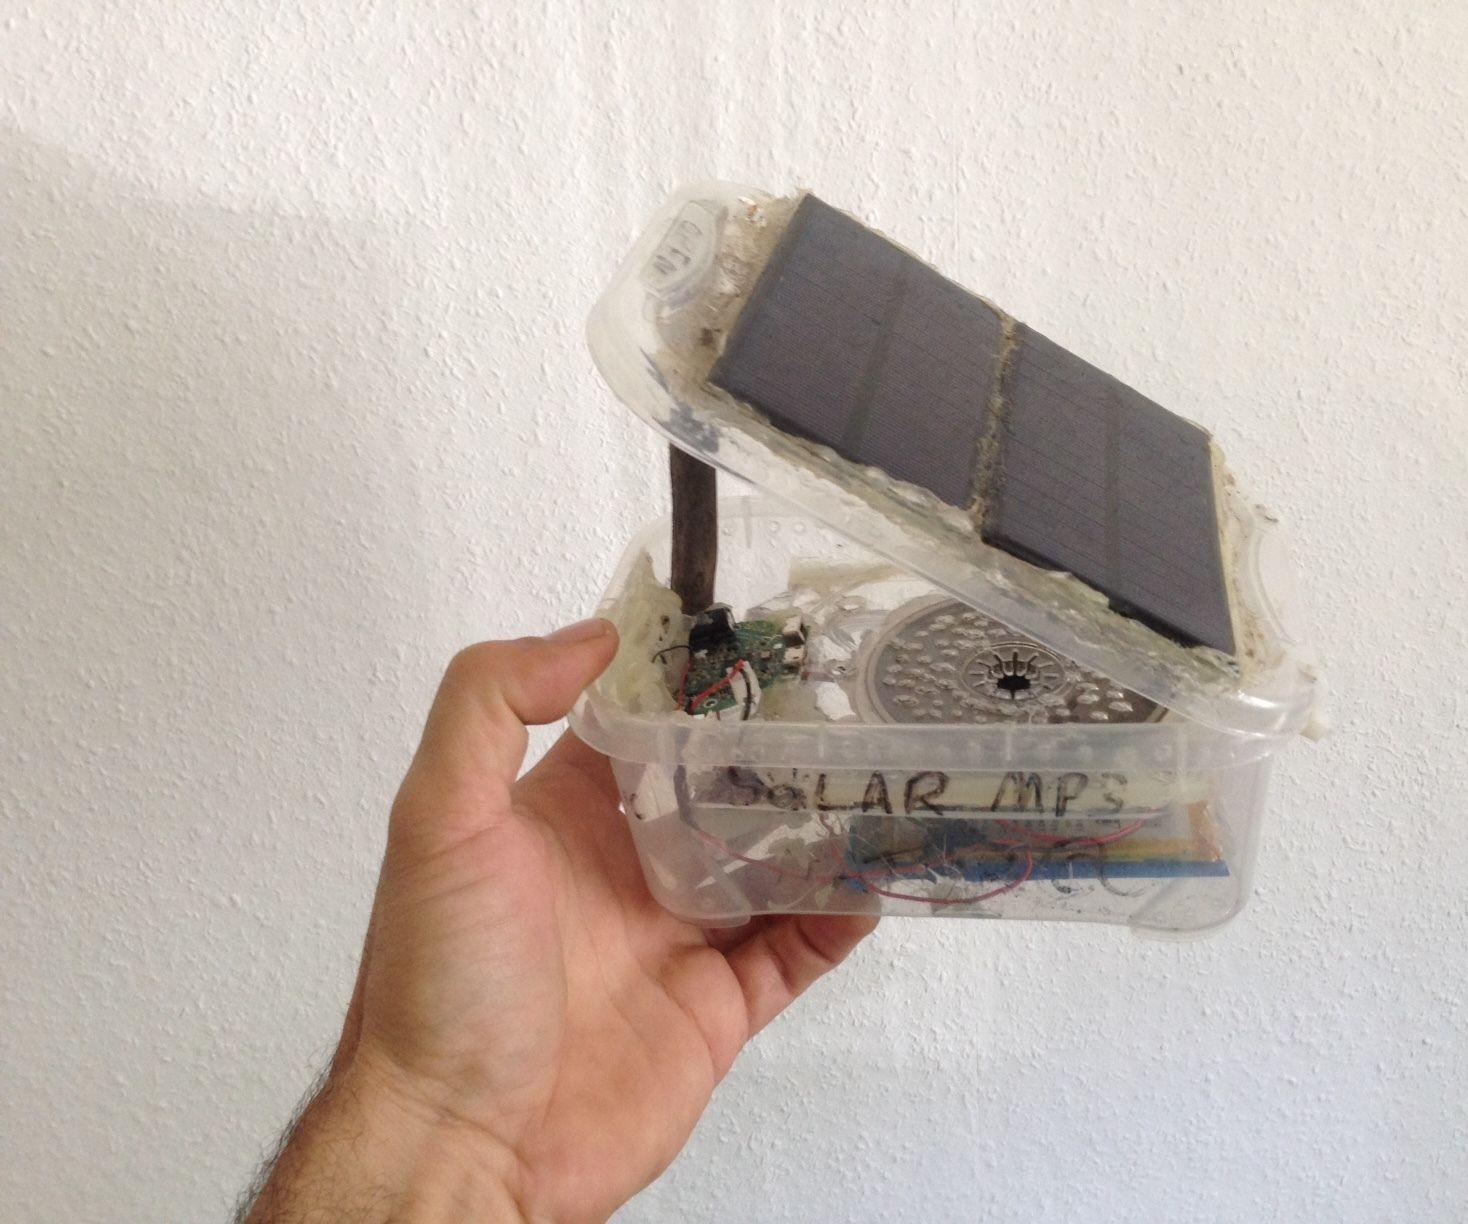 Solar Bluetooth MP3 Player